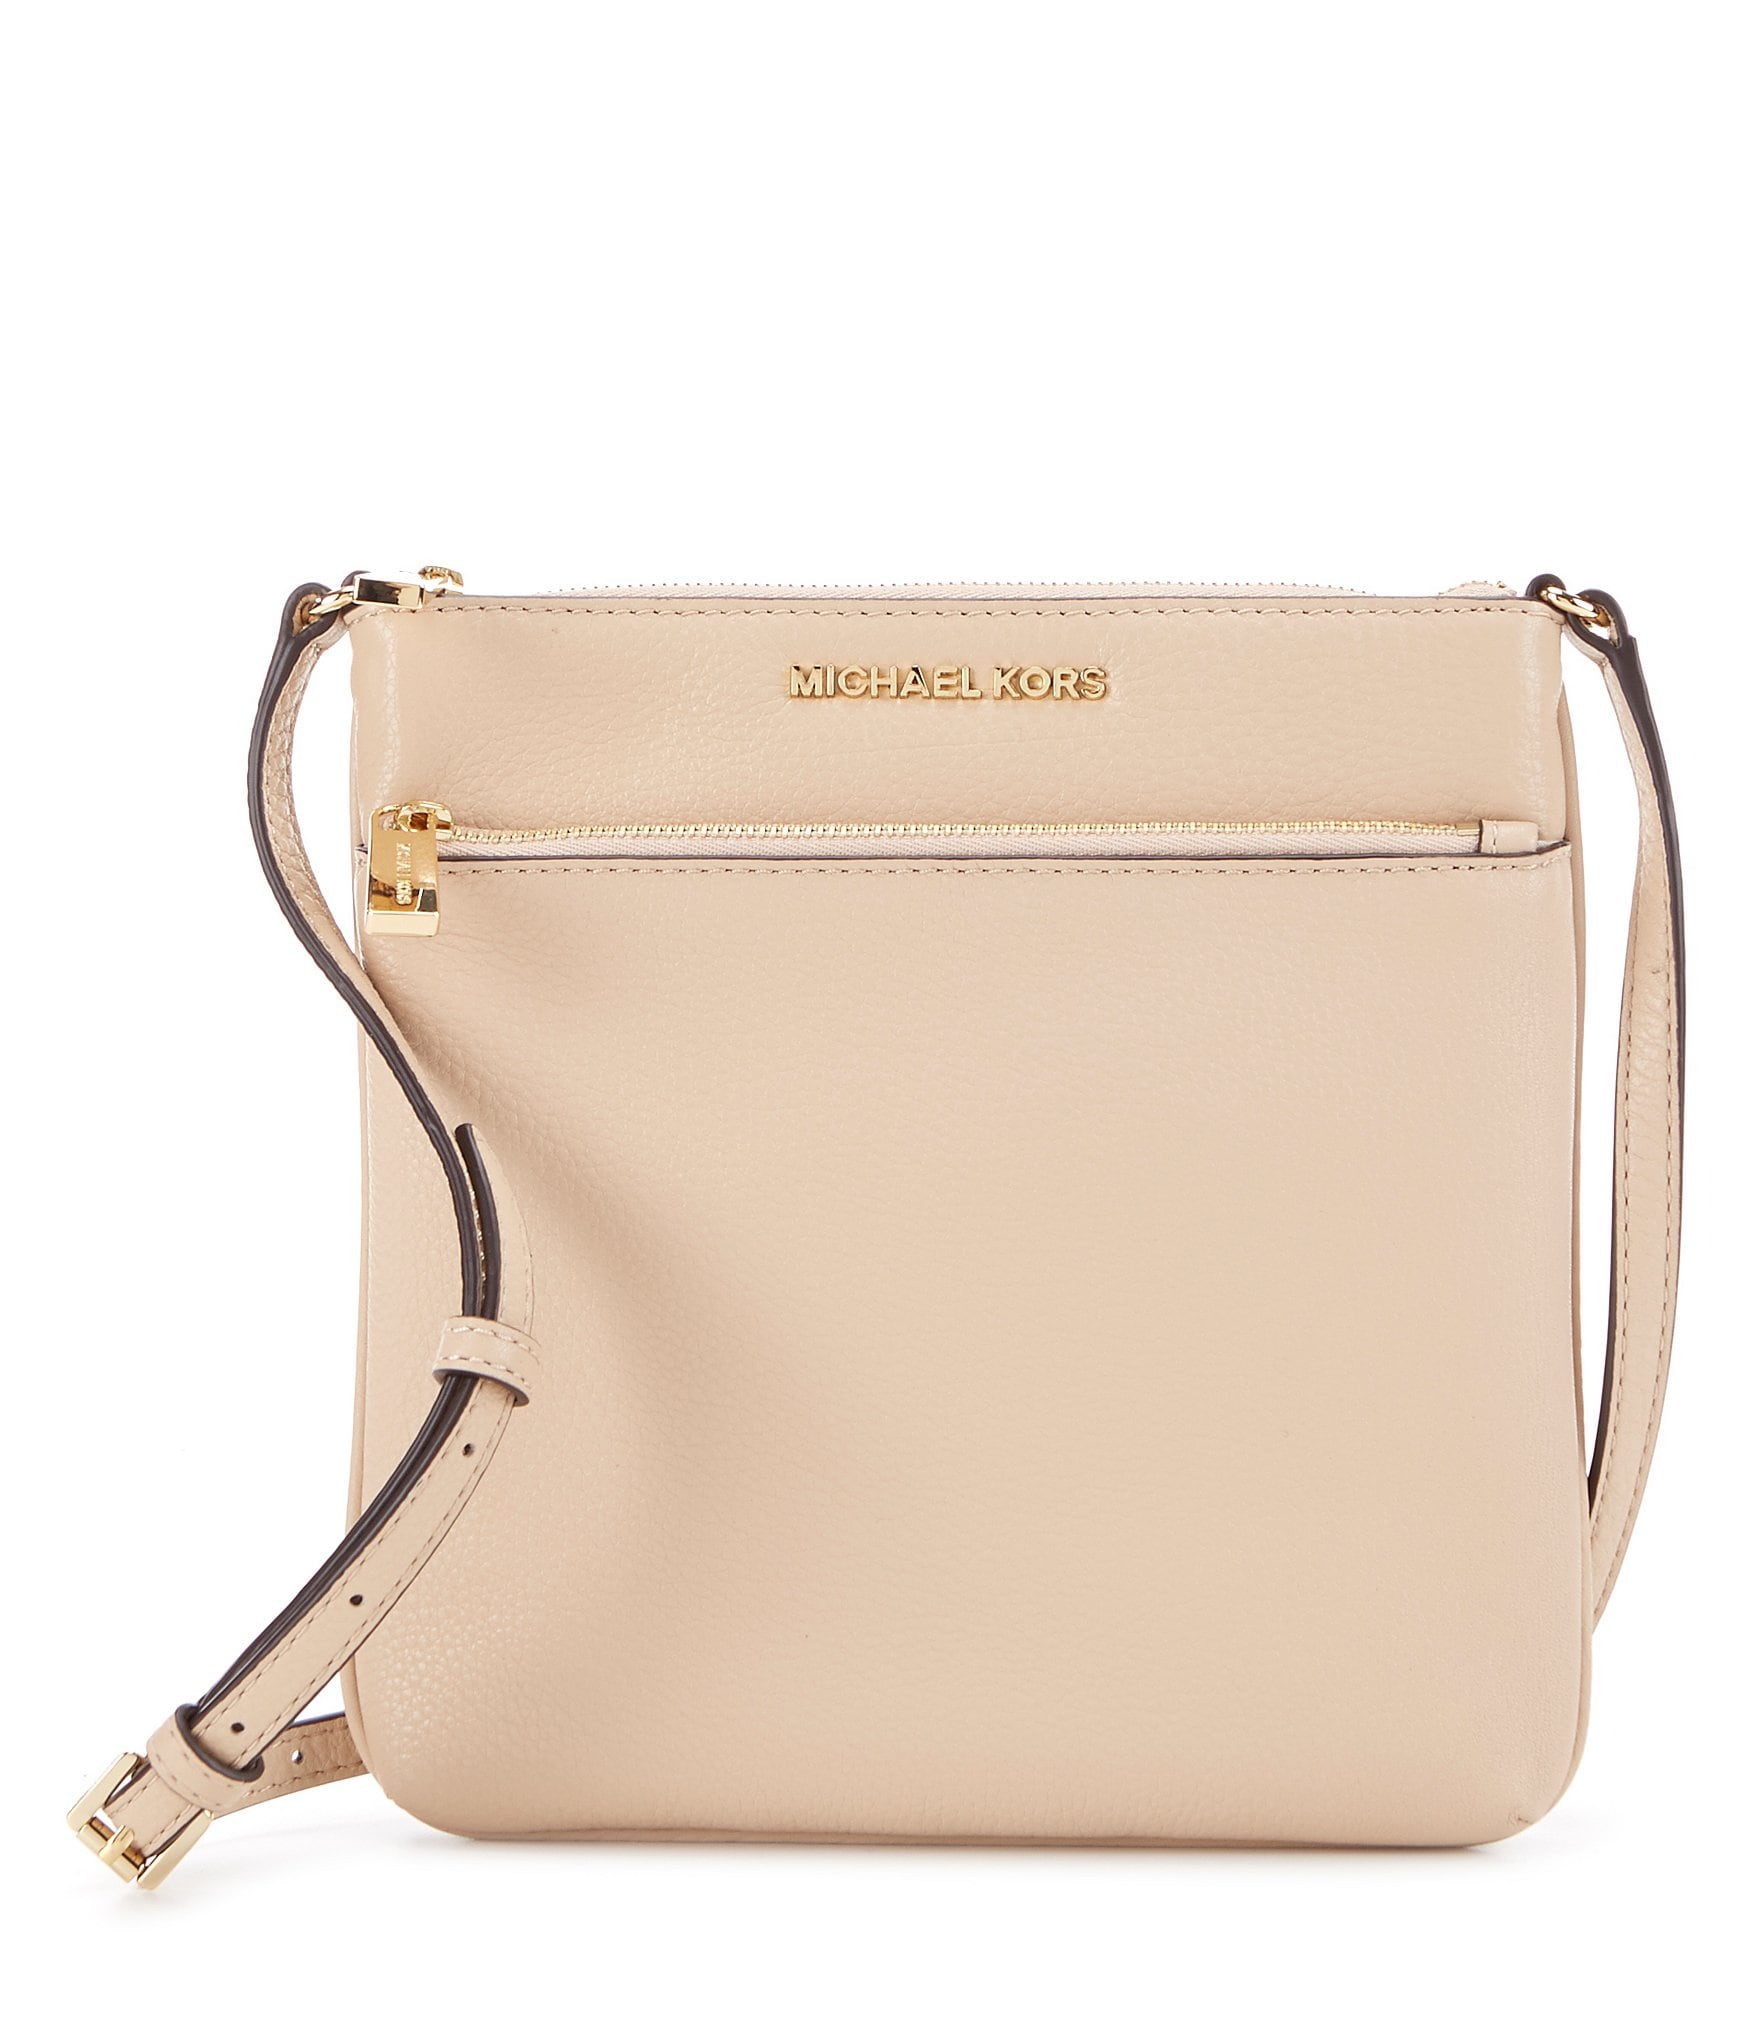 68ab9e35e308 ... michael kors hipster purse my bag collections handbags cross body .